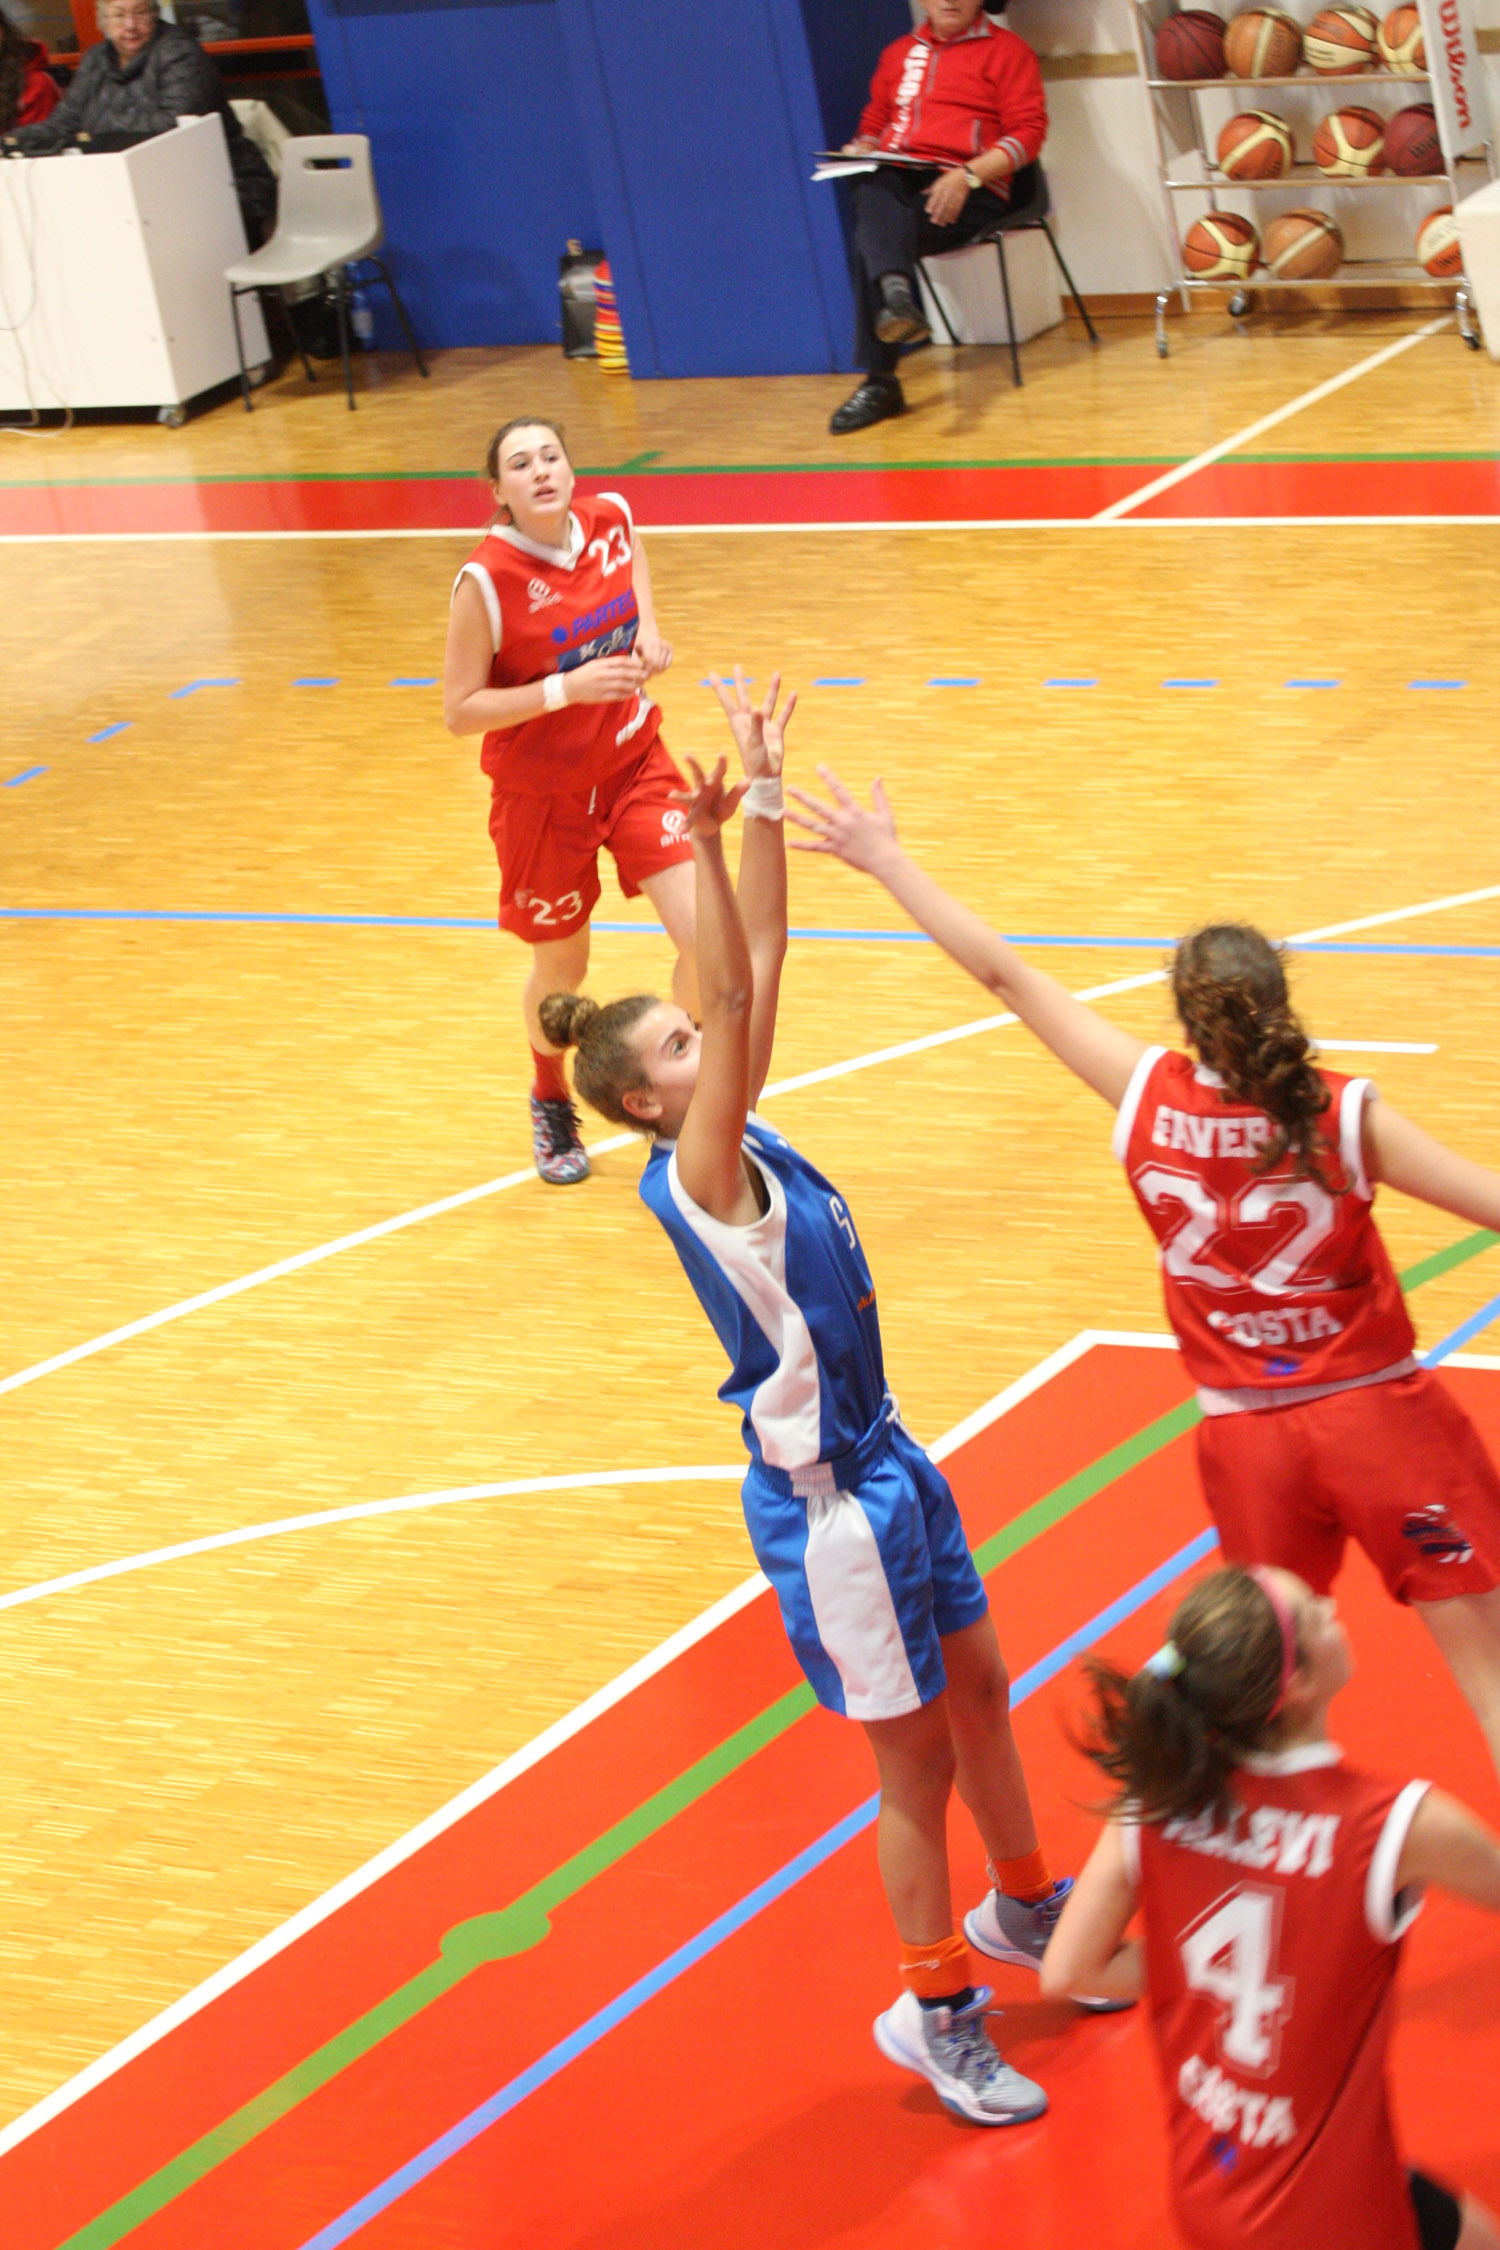 U16E - Costa Masnaga vs Baskettiamo Vittuone 2001 00043.jpg